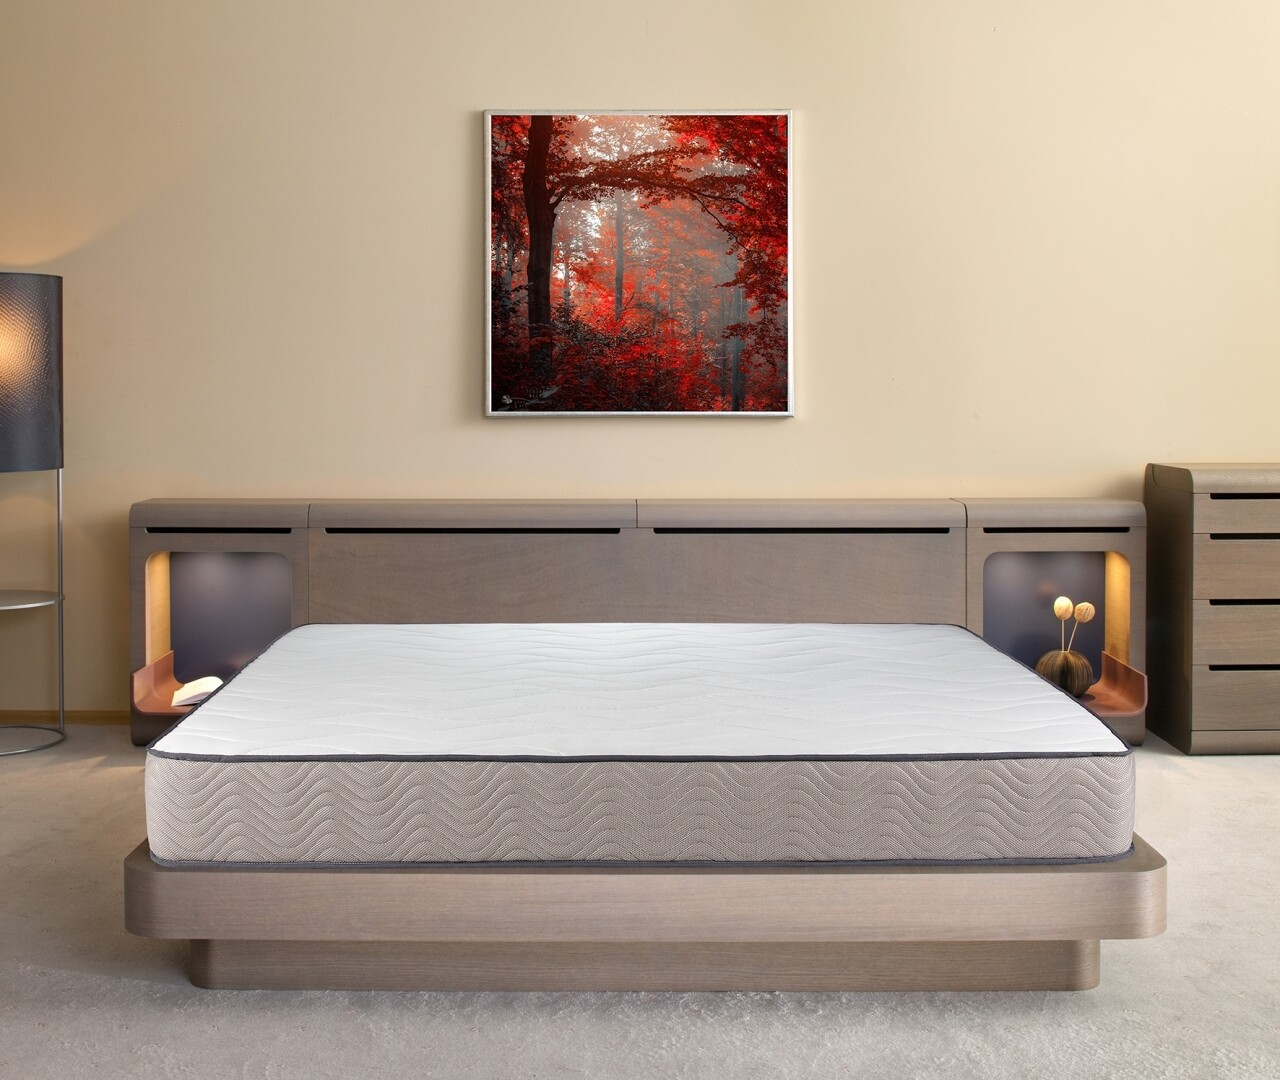 Saltea Bedora, Fresh Memory Grey Line, Ortopedica, Anatomica 160x200 cm